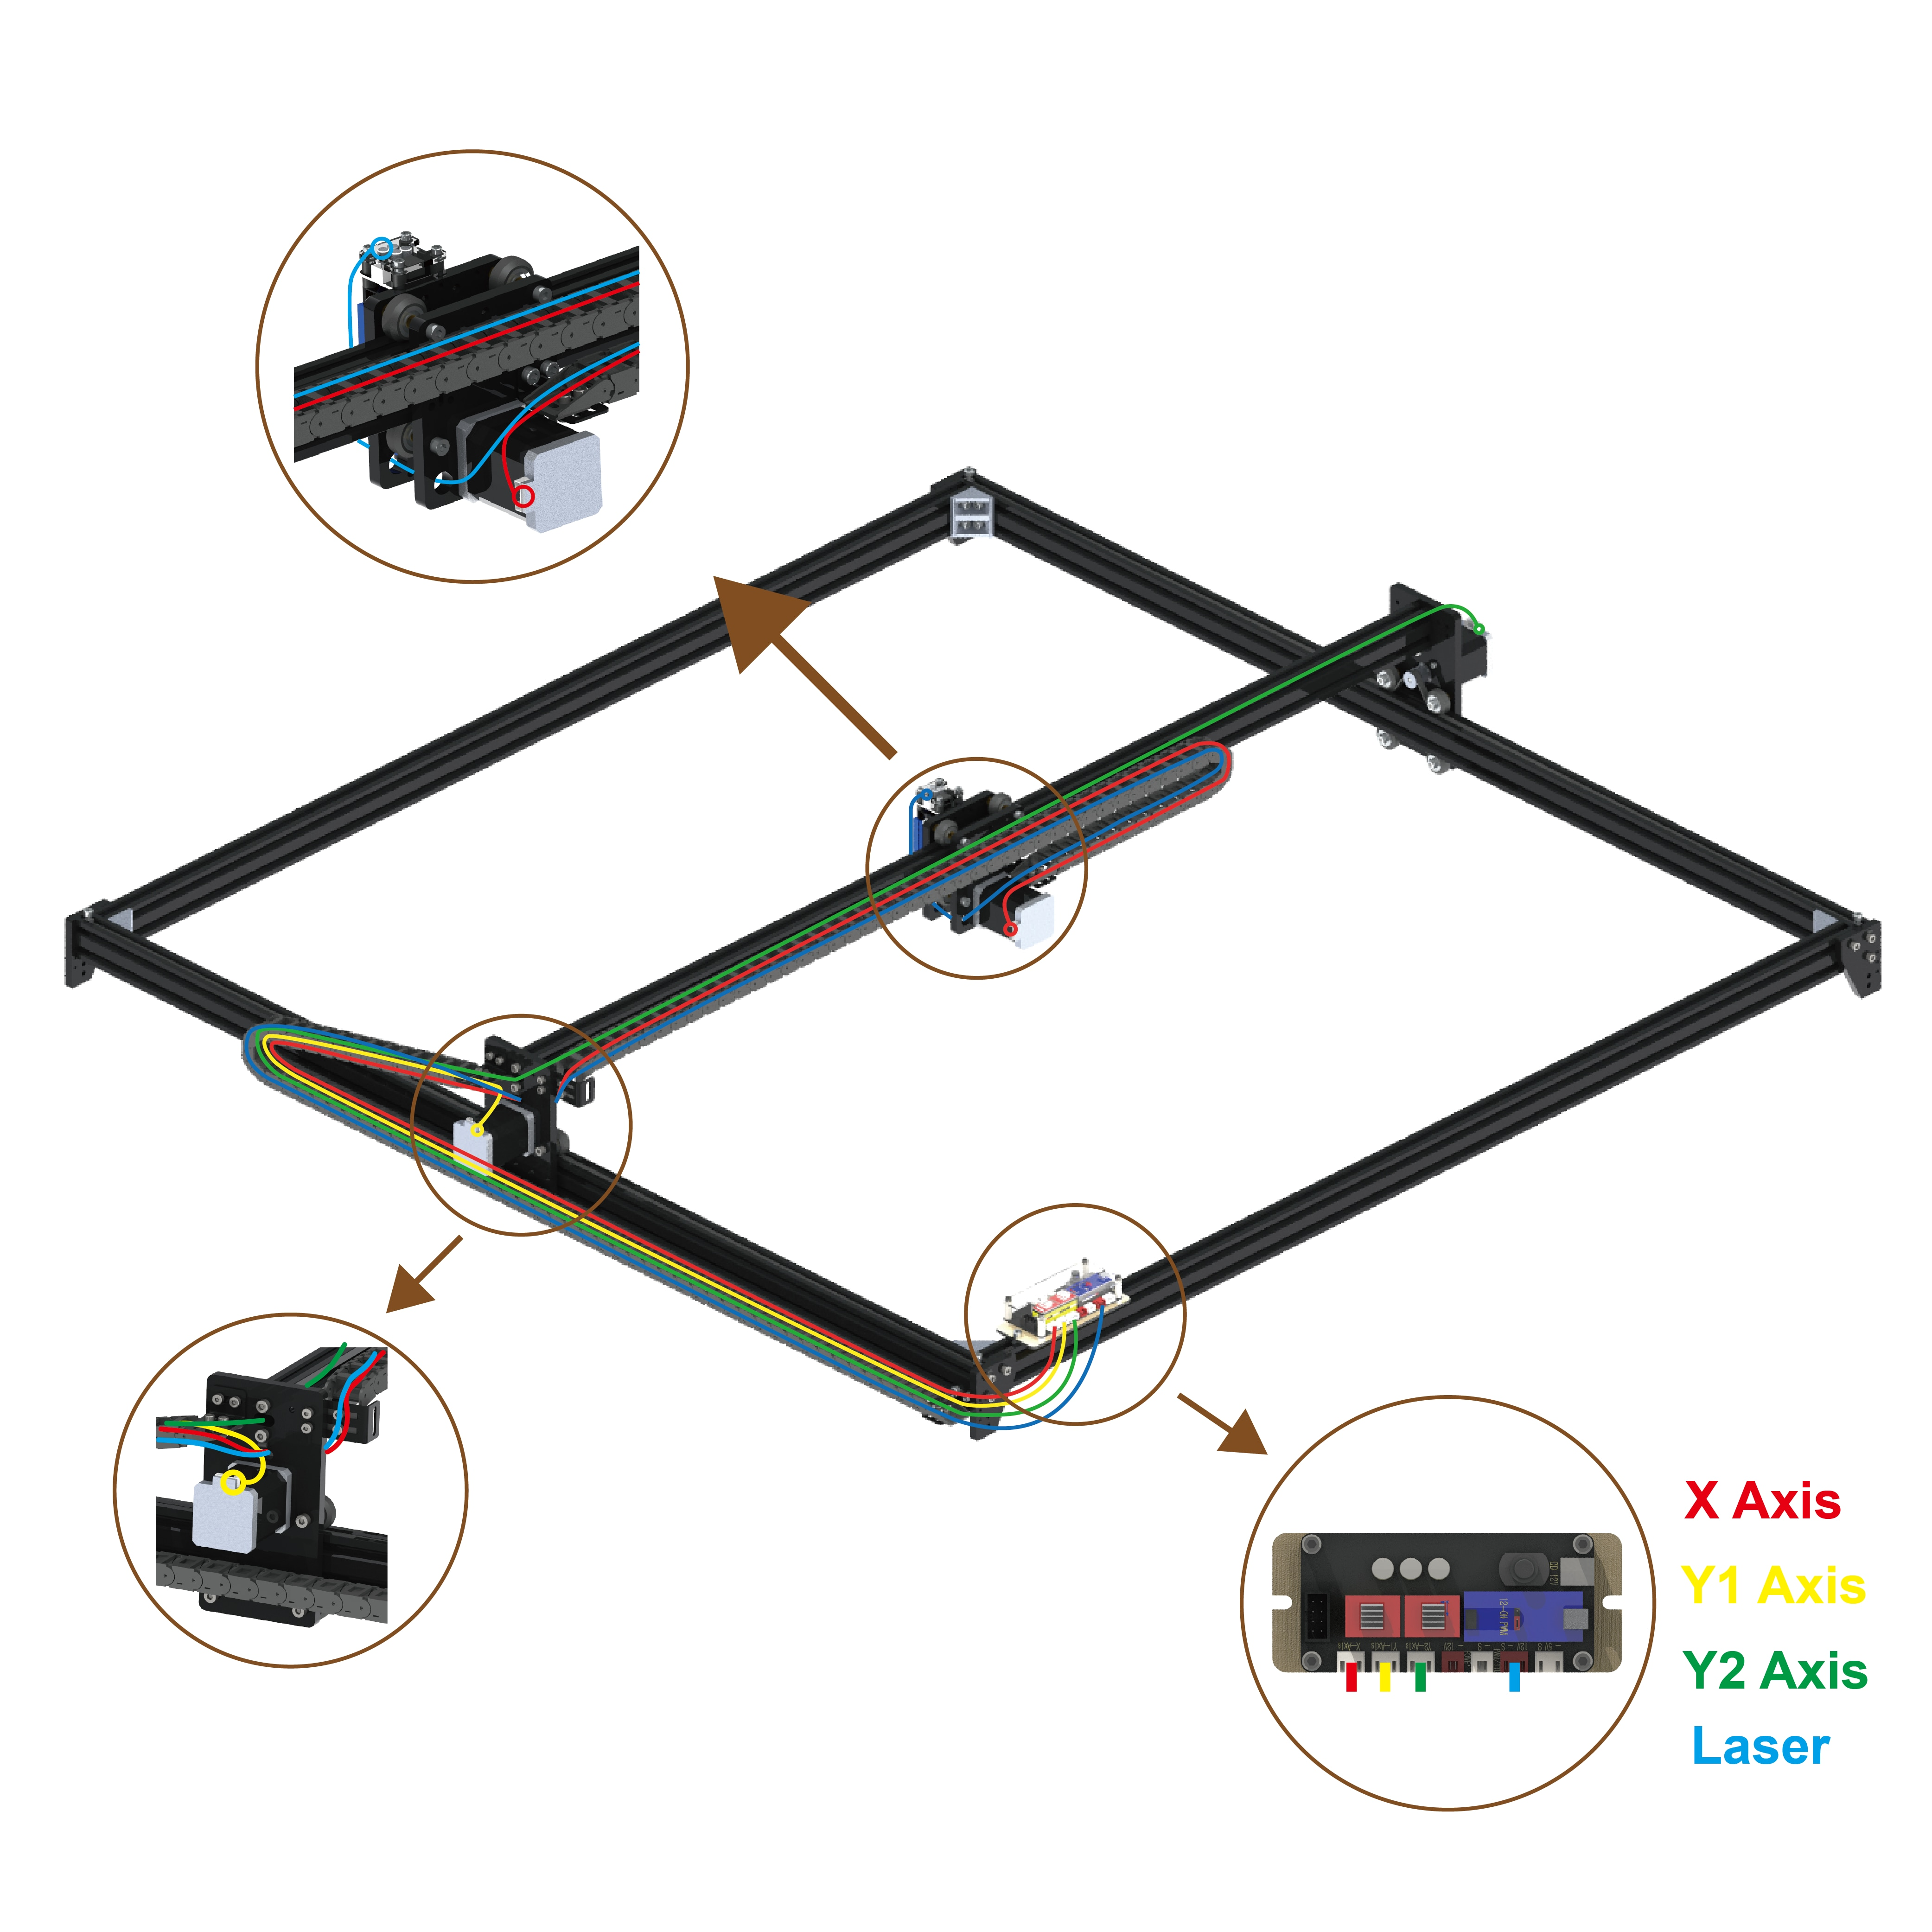 40W Laser Engraving Cutting Wood With GRBL Motherboard Laser Printer/Engraving Machine CNC Laser Engraver For Metal enlarge